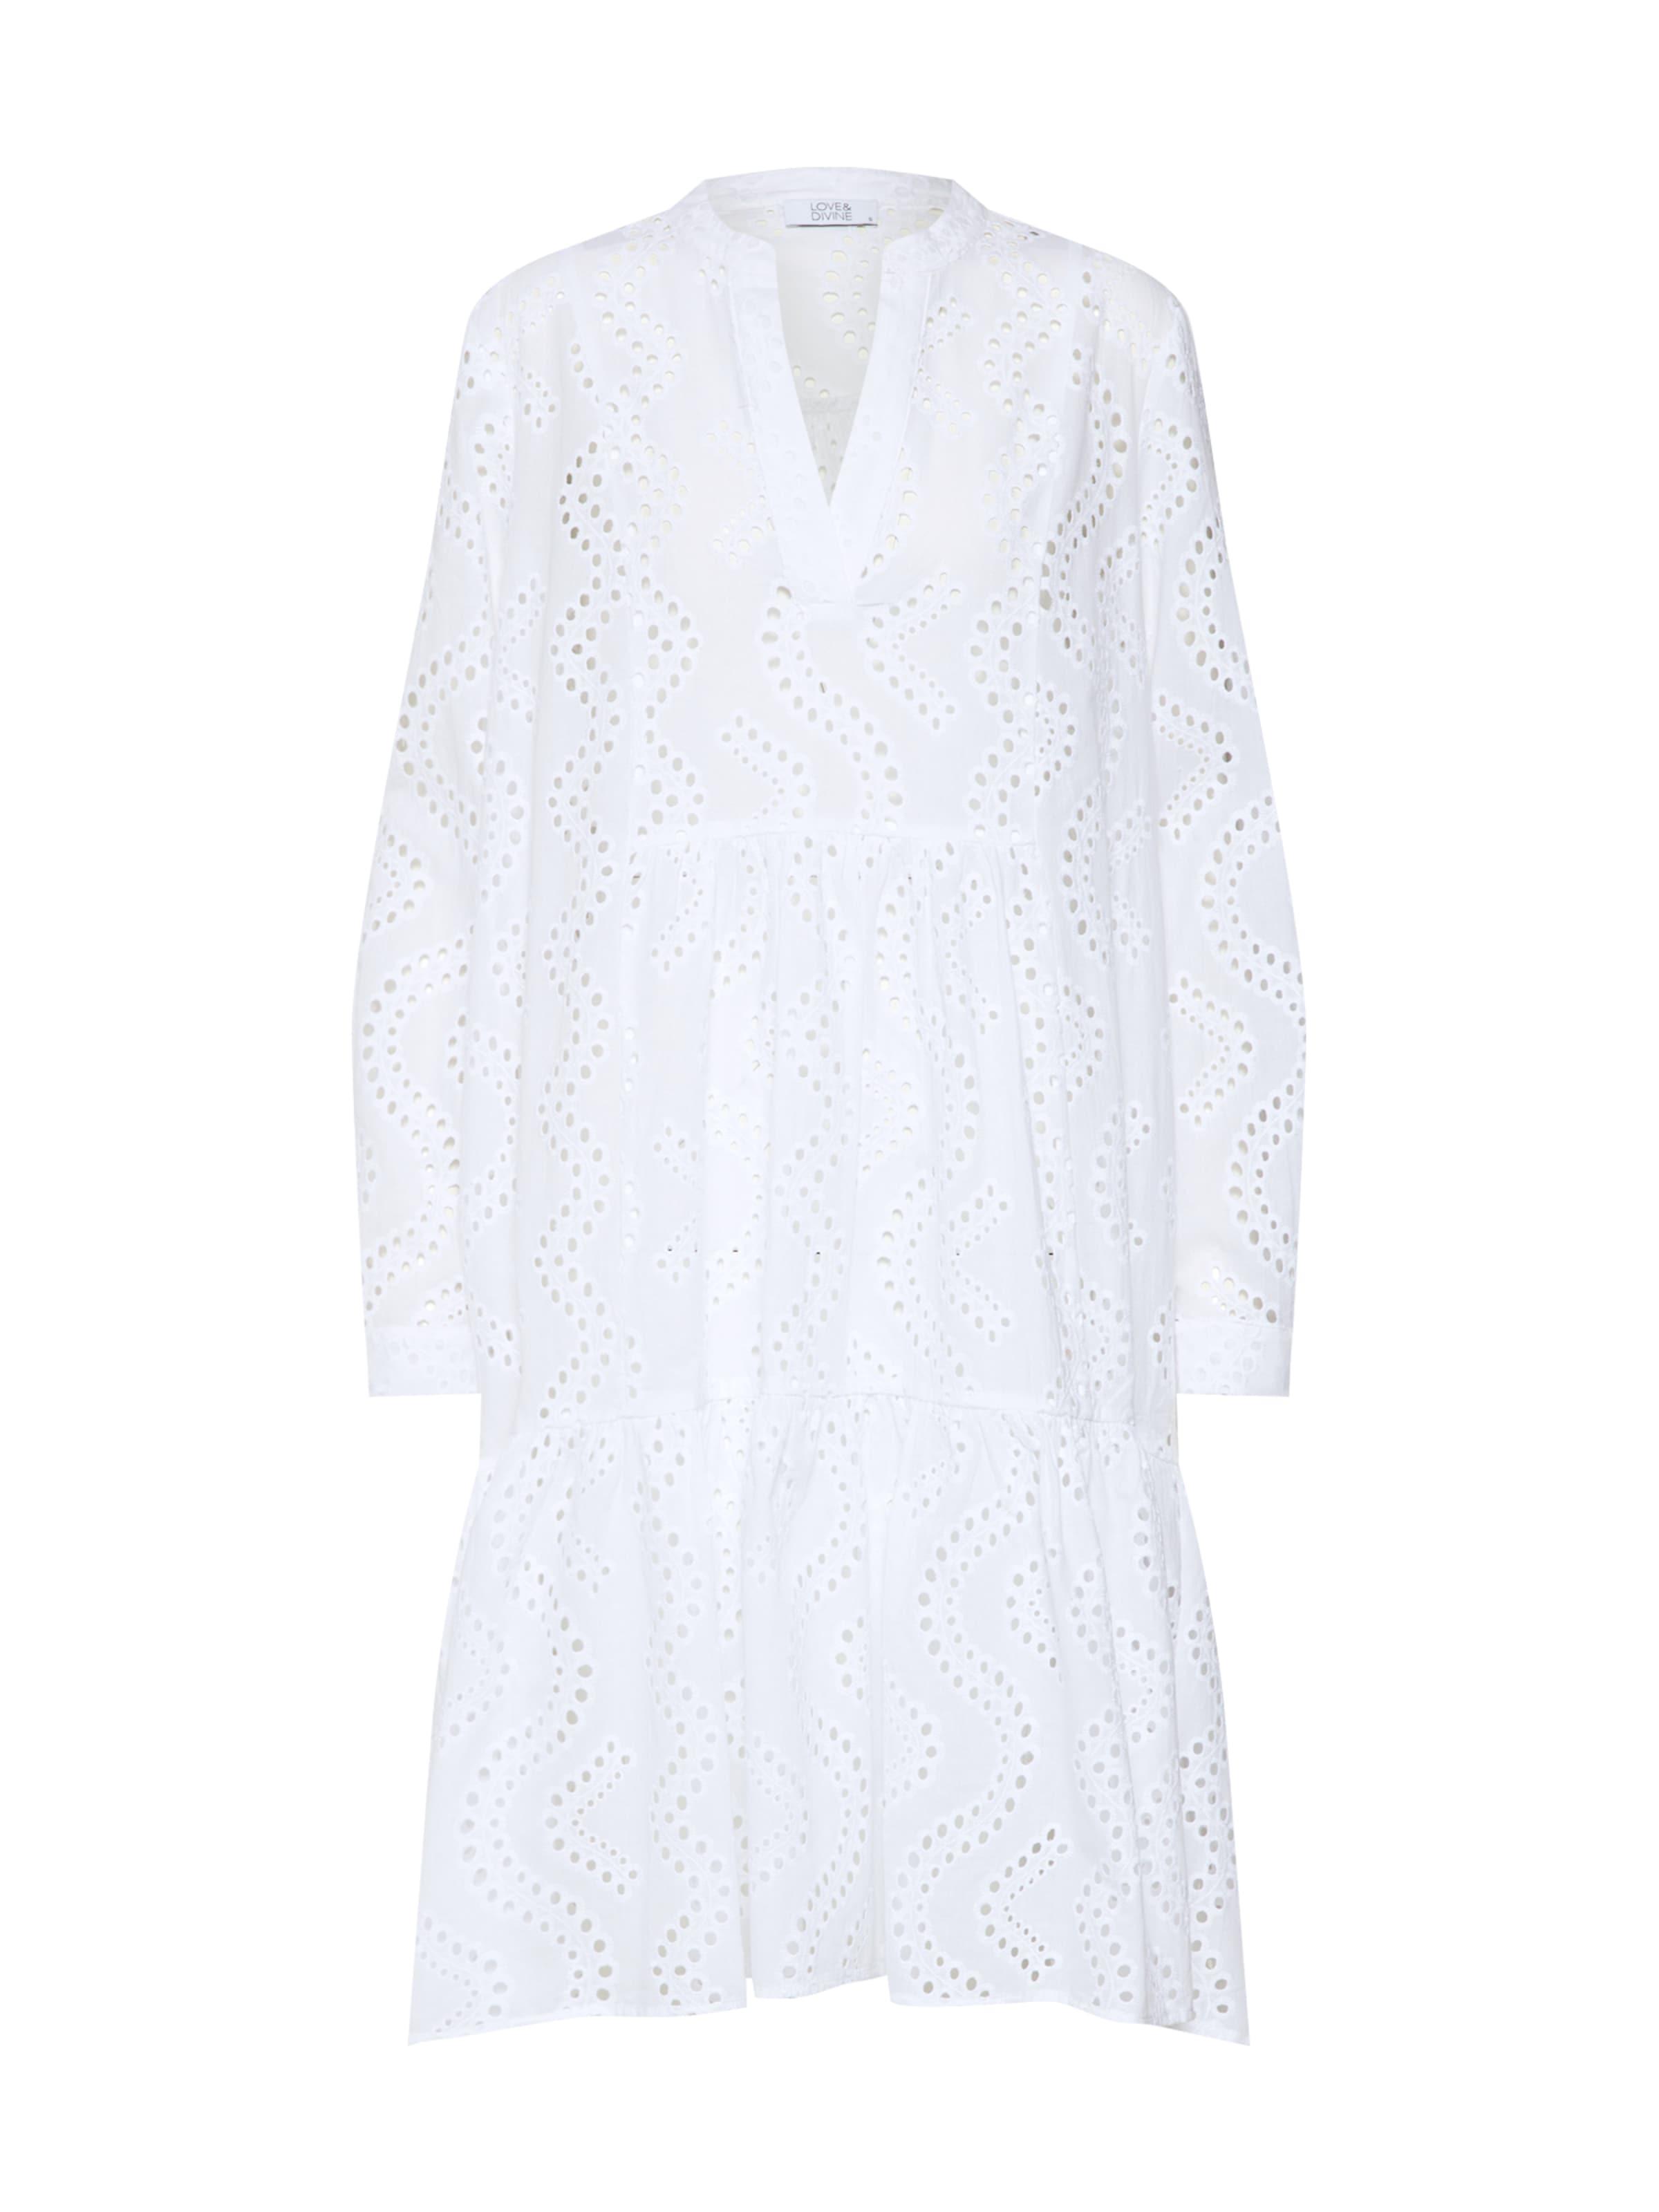 'love346 1' chemise En Divine Blanc Robe Loveamp; W9EHI2D